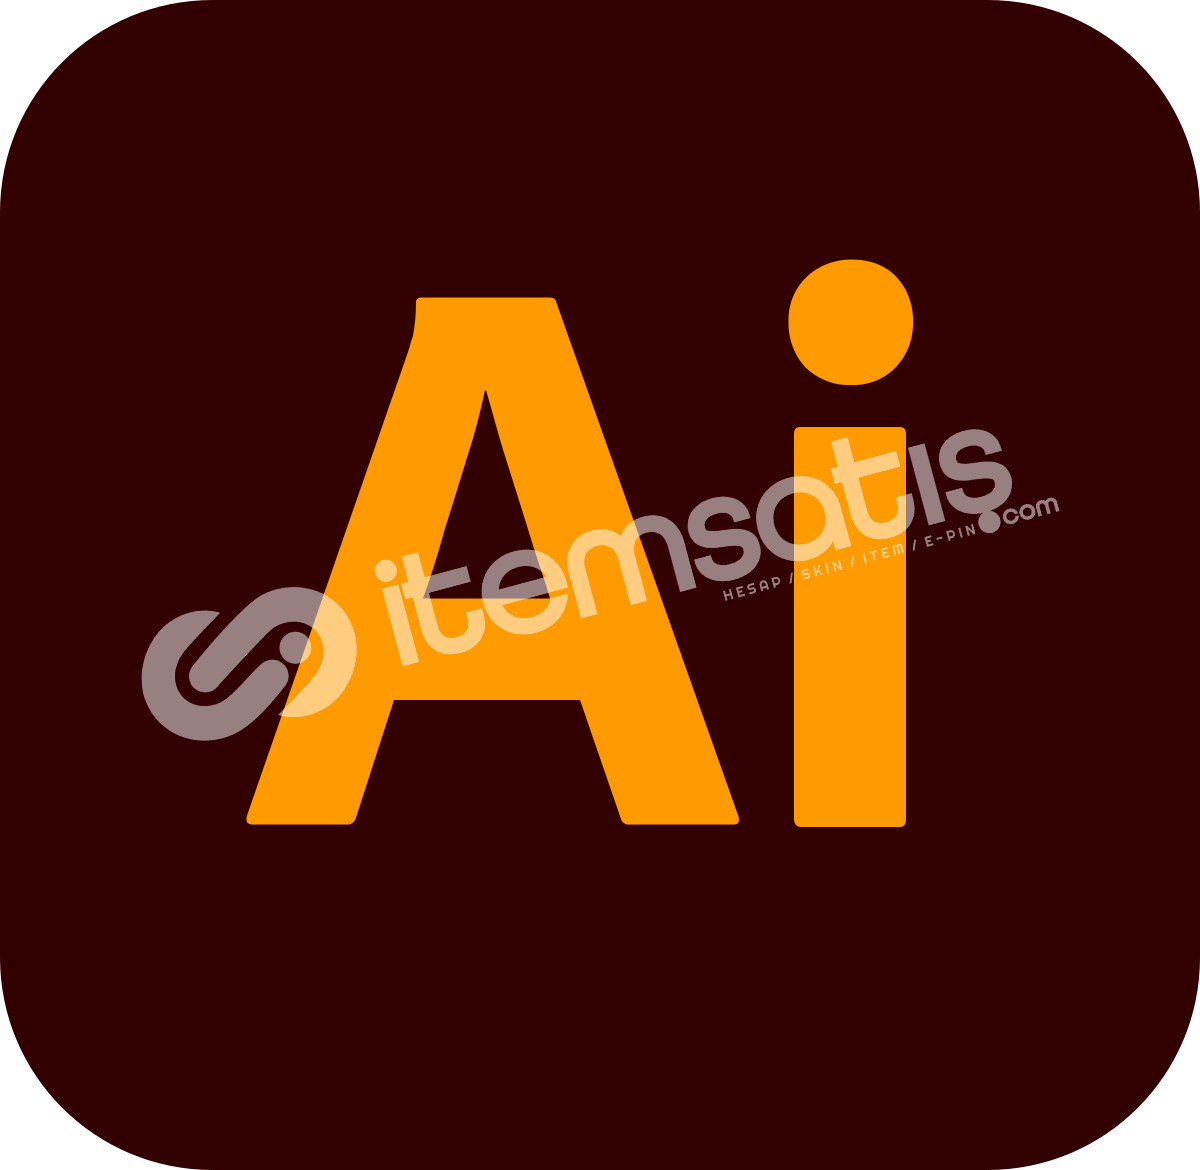 Adobe İllustrator 2020